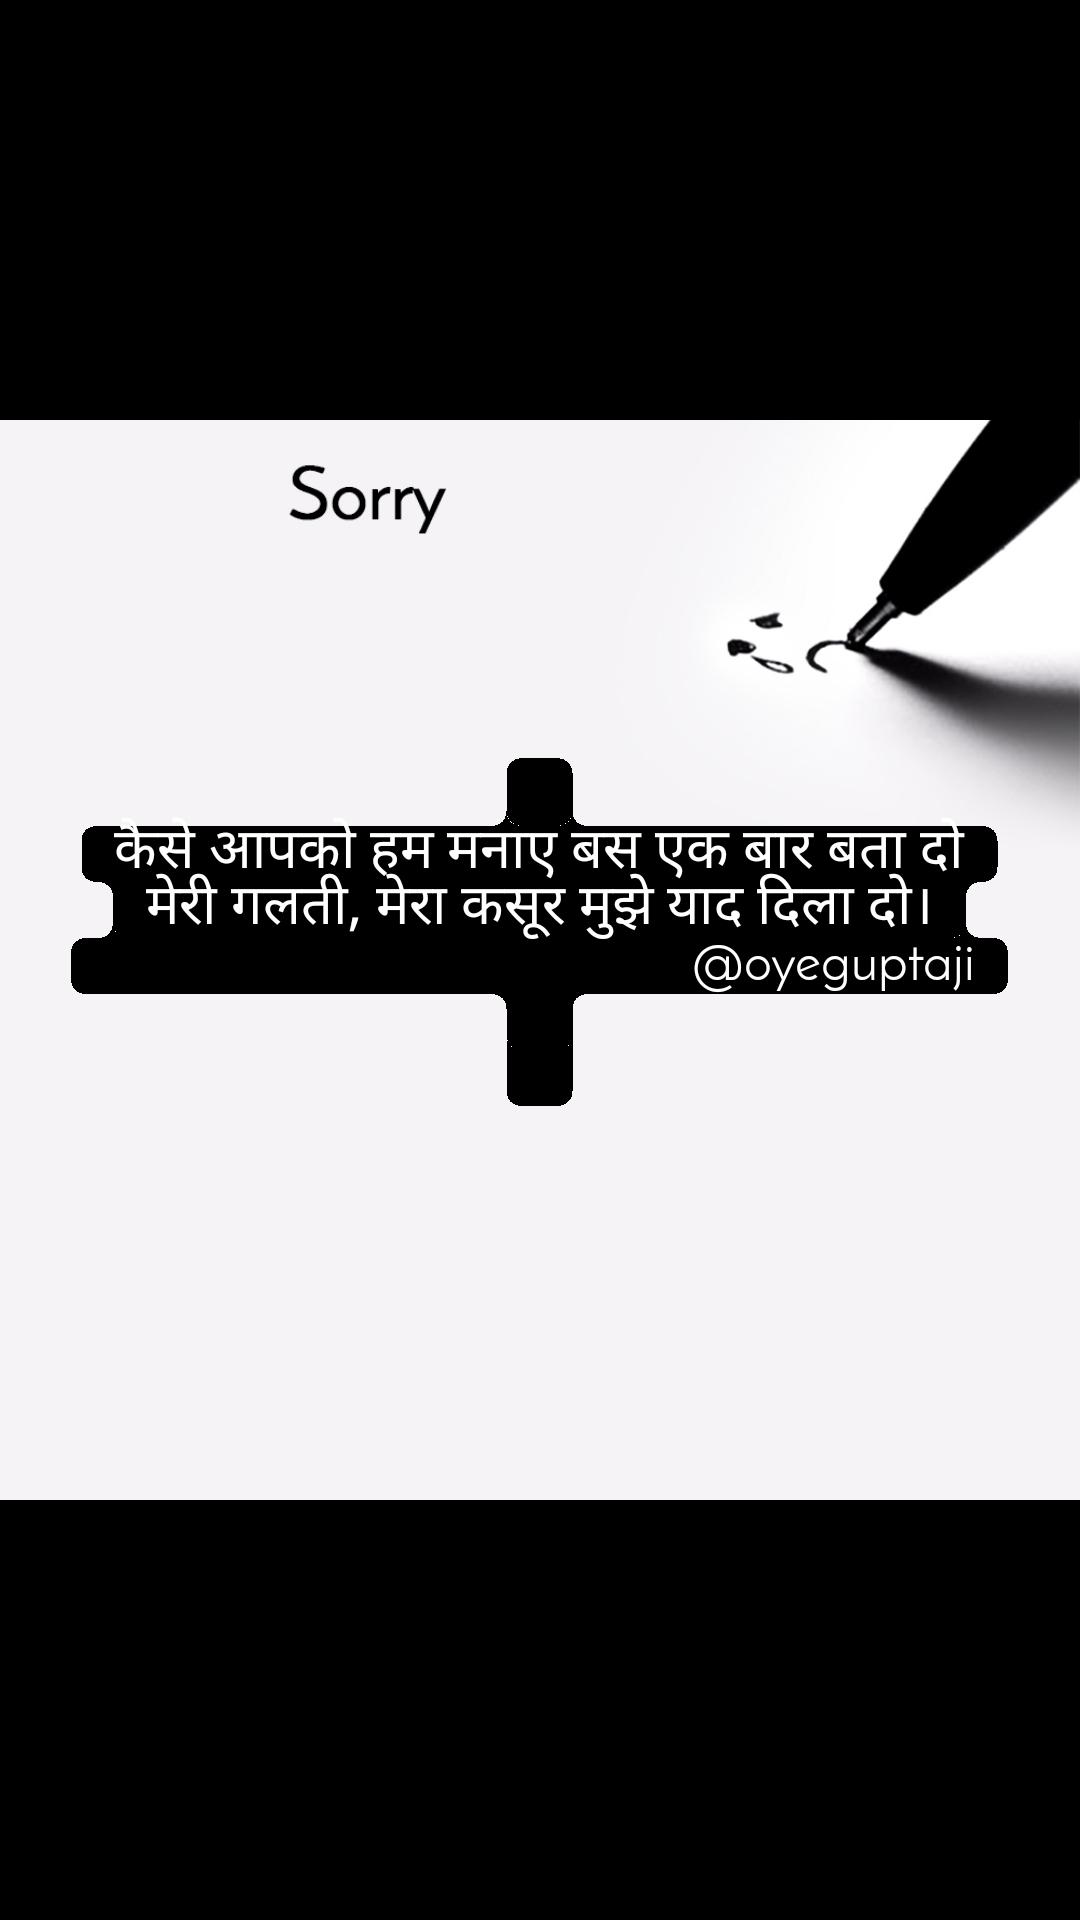 Sorry  कैसे आपको हम मनाए बस एक बार बता दो मेरी गलती, मेरा कसूर मुझे याद दिला दो।                                           @oyeguptaji